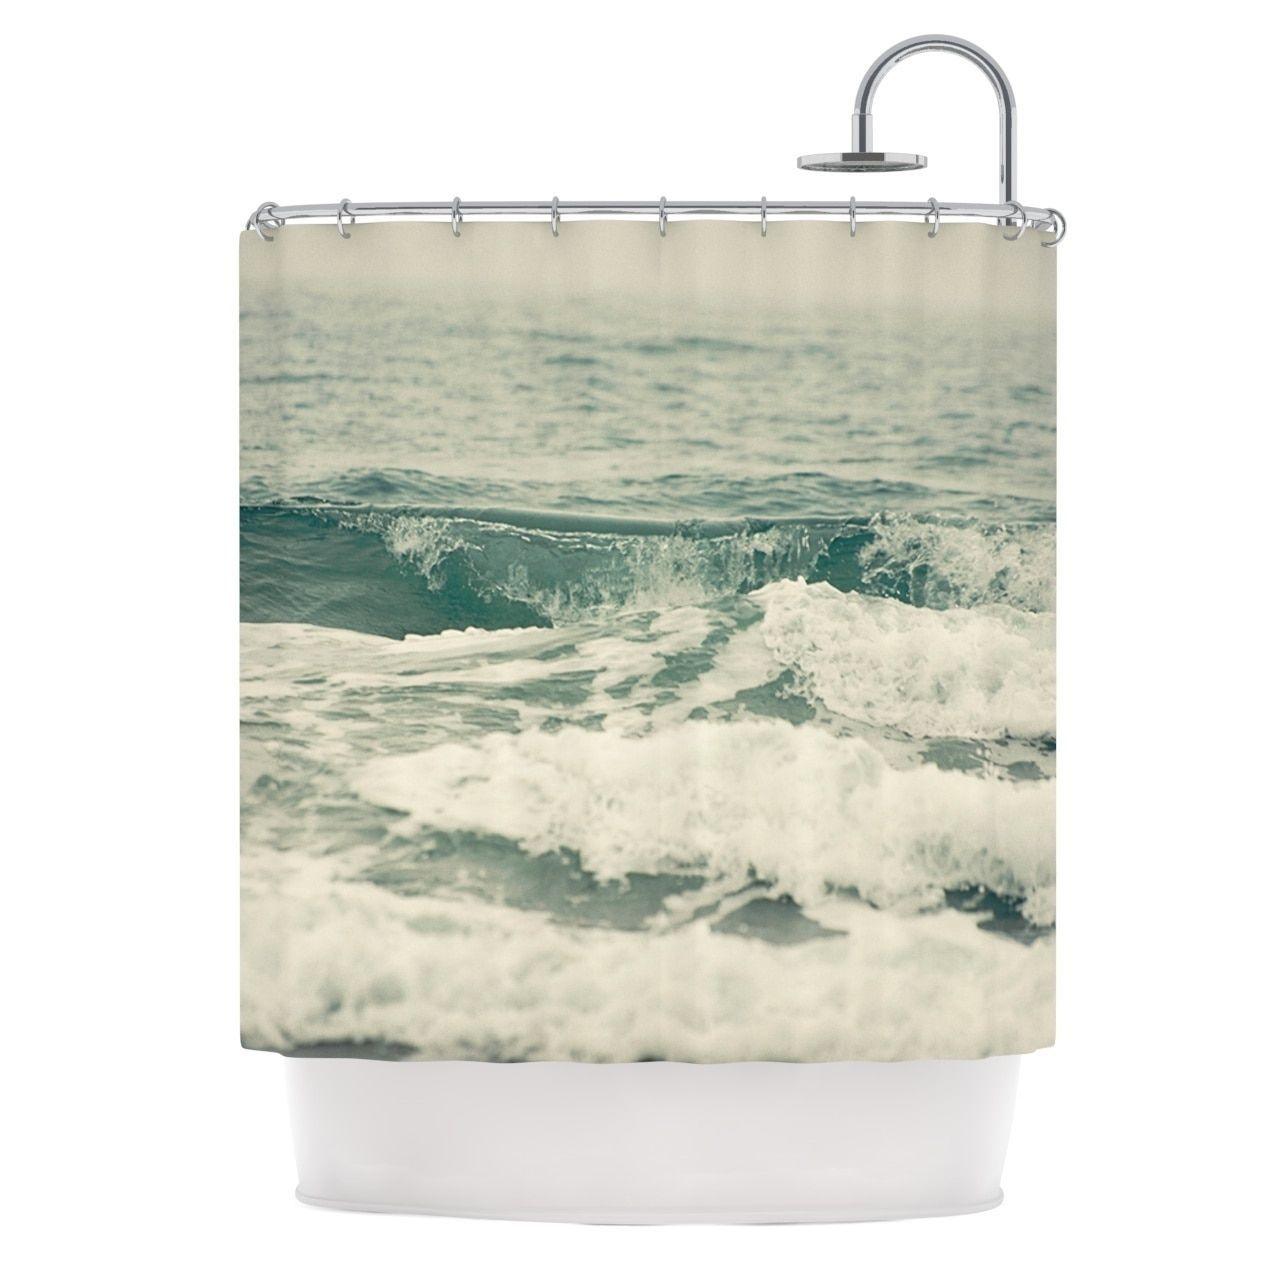 Ocean shower curtains - Kess Inhouse Cristina Mitchell Crashing Waves Teal Ocean Shower Curtain 69x70 By Kess Inhouse